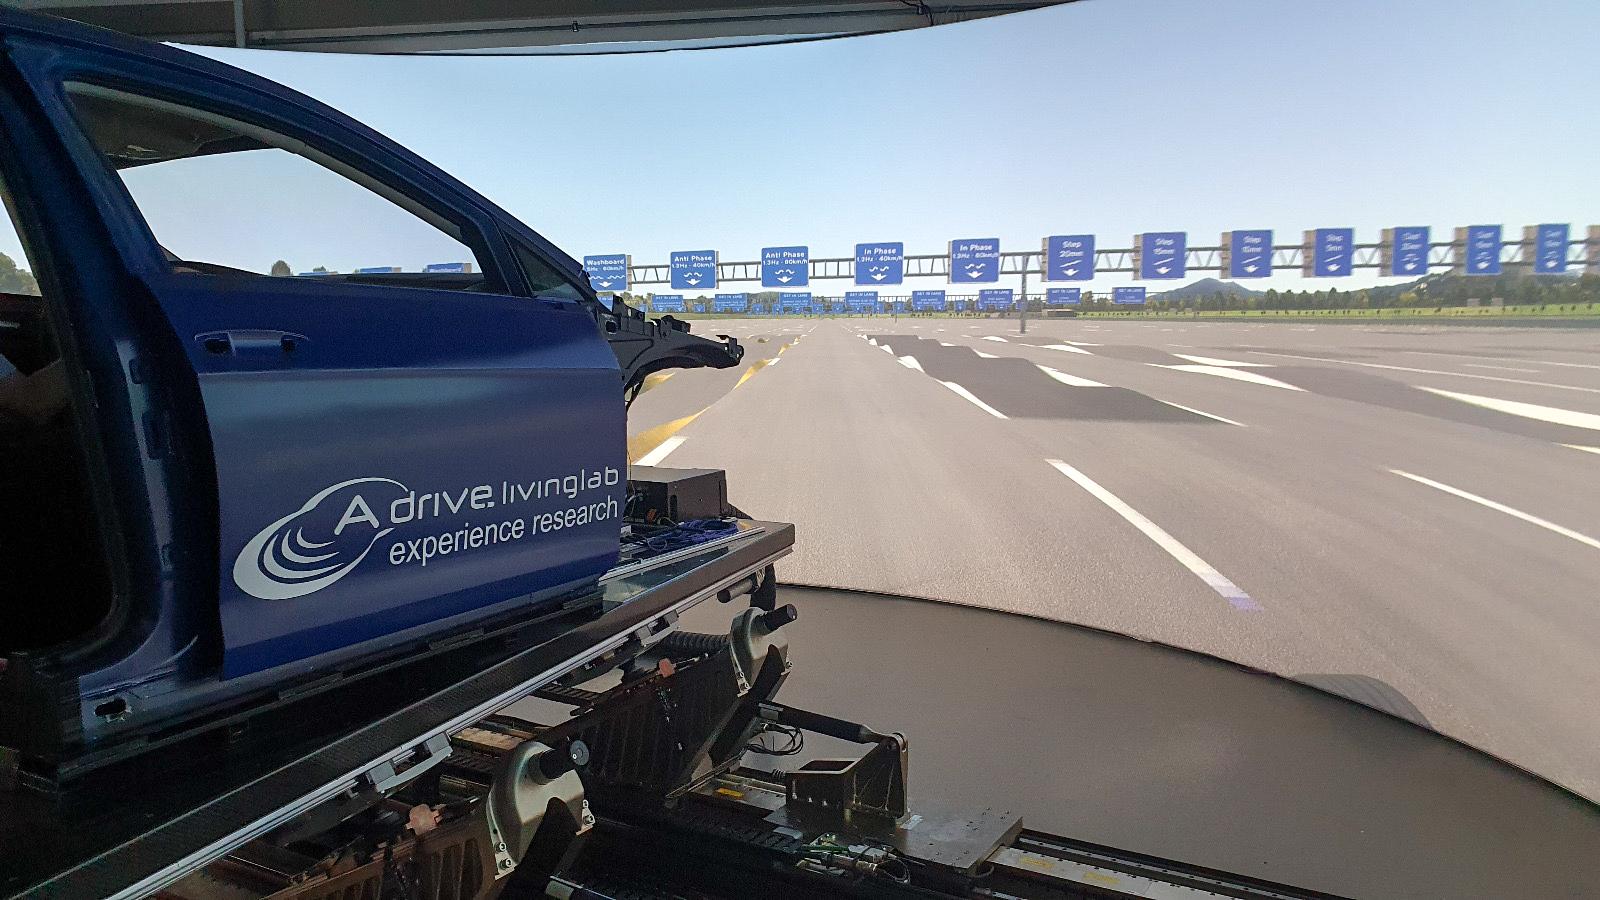 Fahrsimulator neues Cockpit, Fahrzeugkarosserie